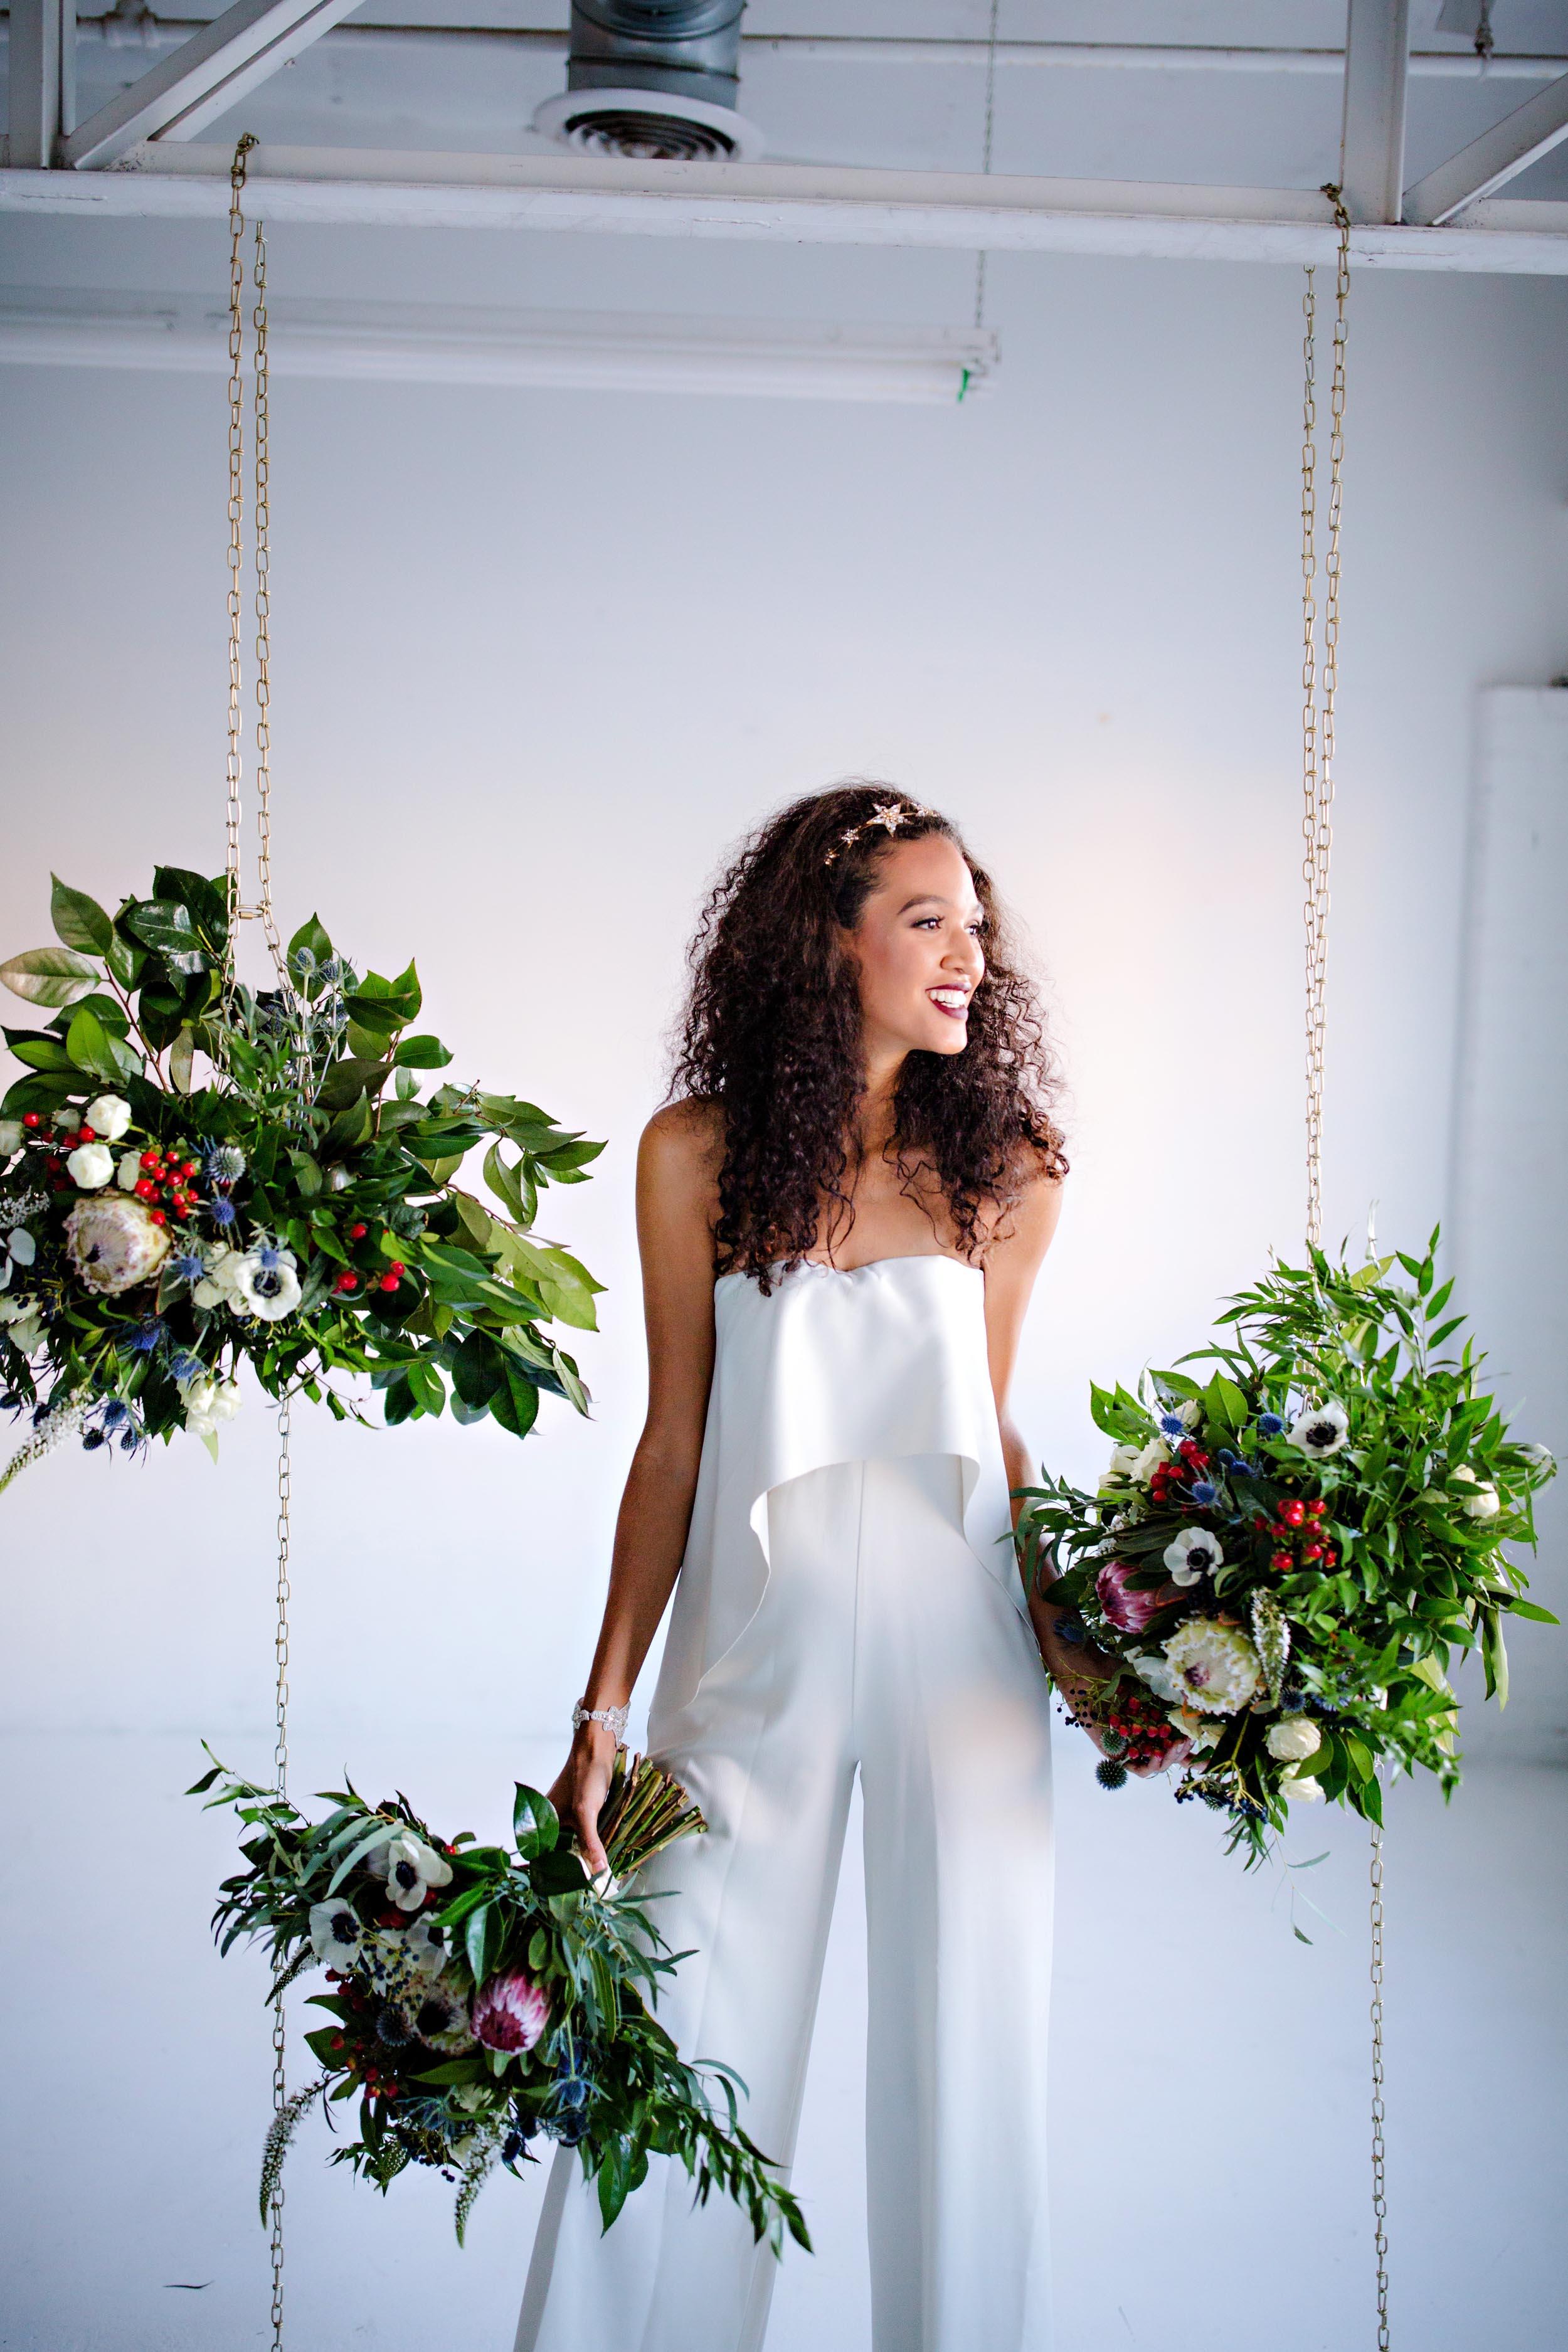 weddings-starsstripes-28.jpg